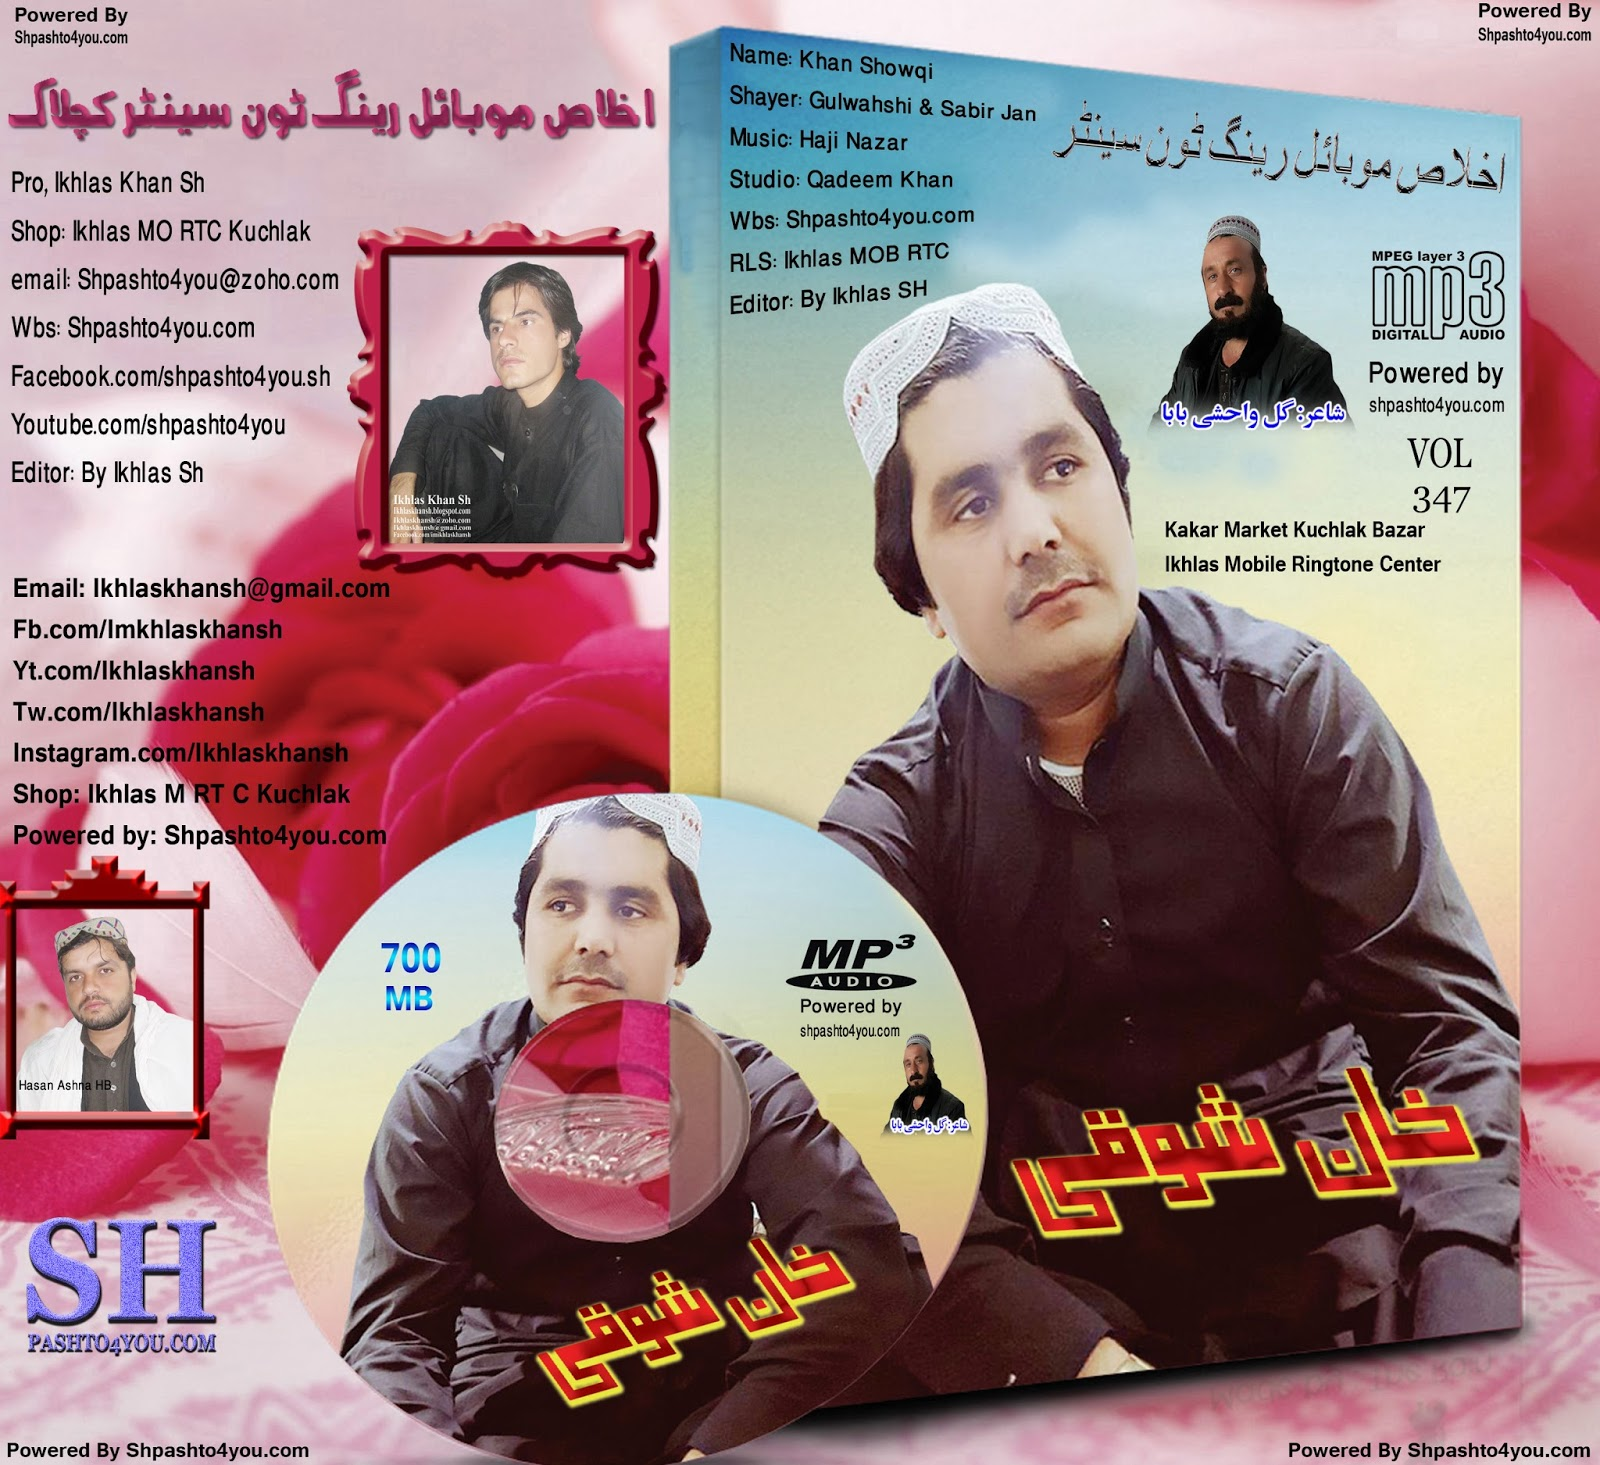 Khan Showqi Pashto Mp3 New Songs 2018 Apr